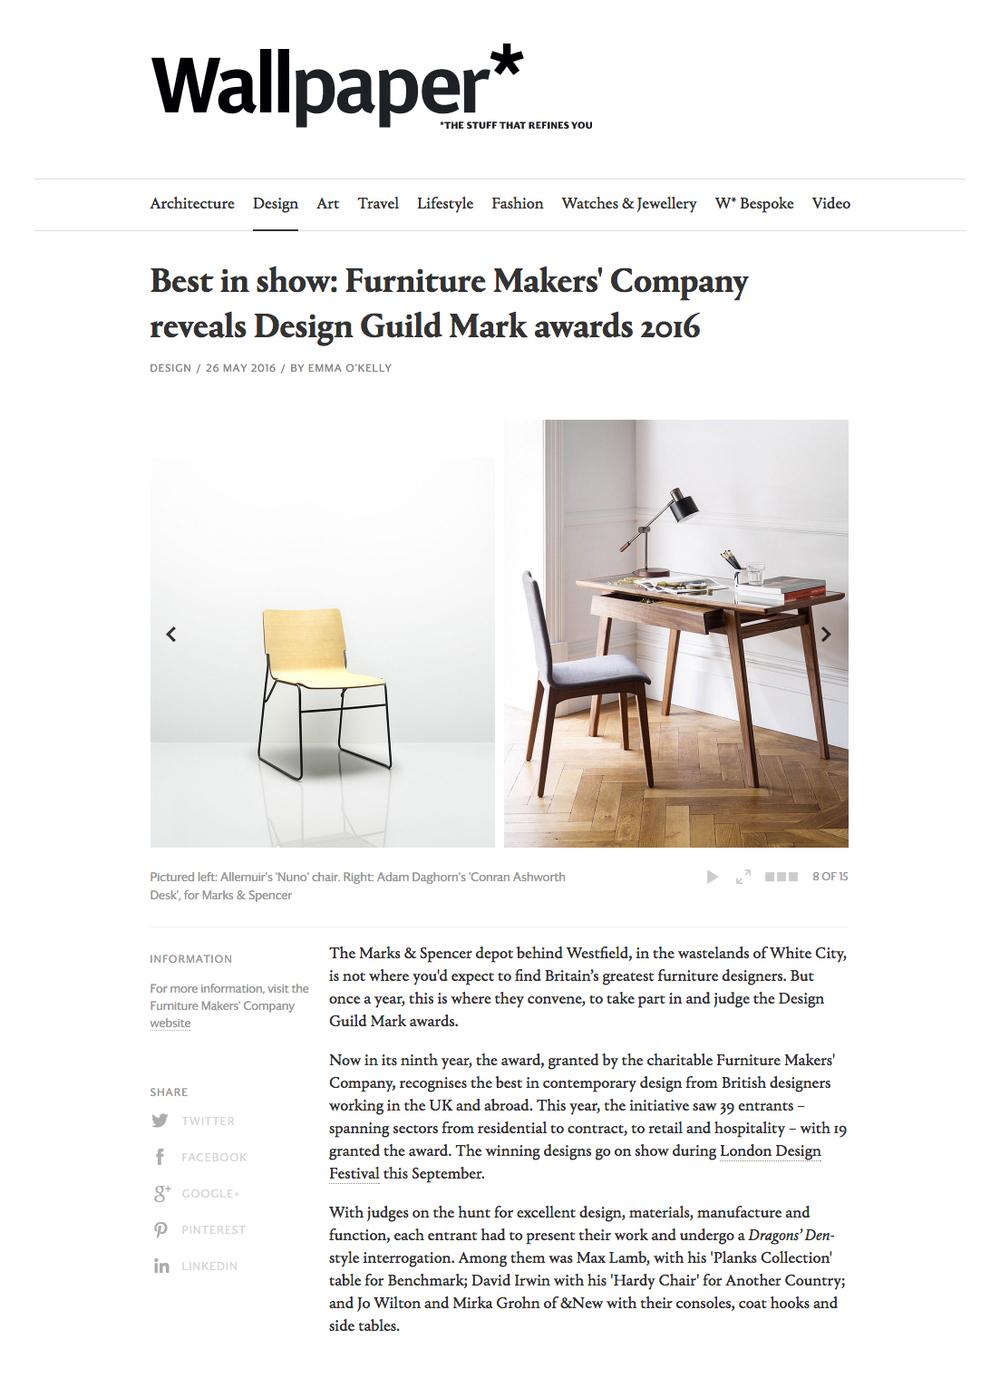 Emma O'Kelly - Editor of Wallpaper -May 2016  M&S Home